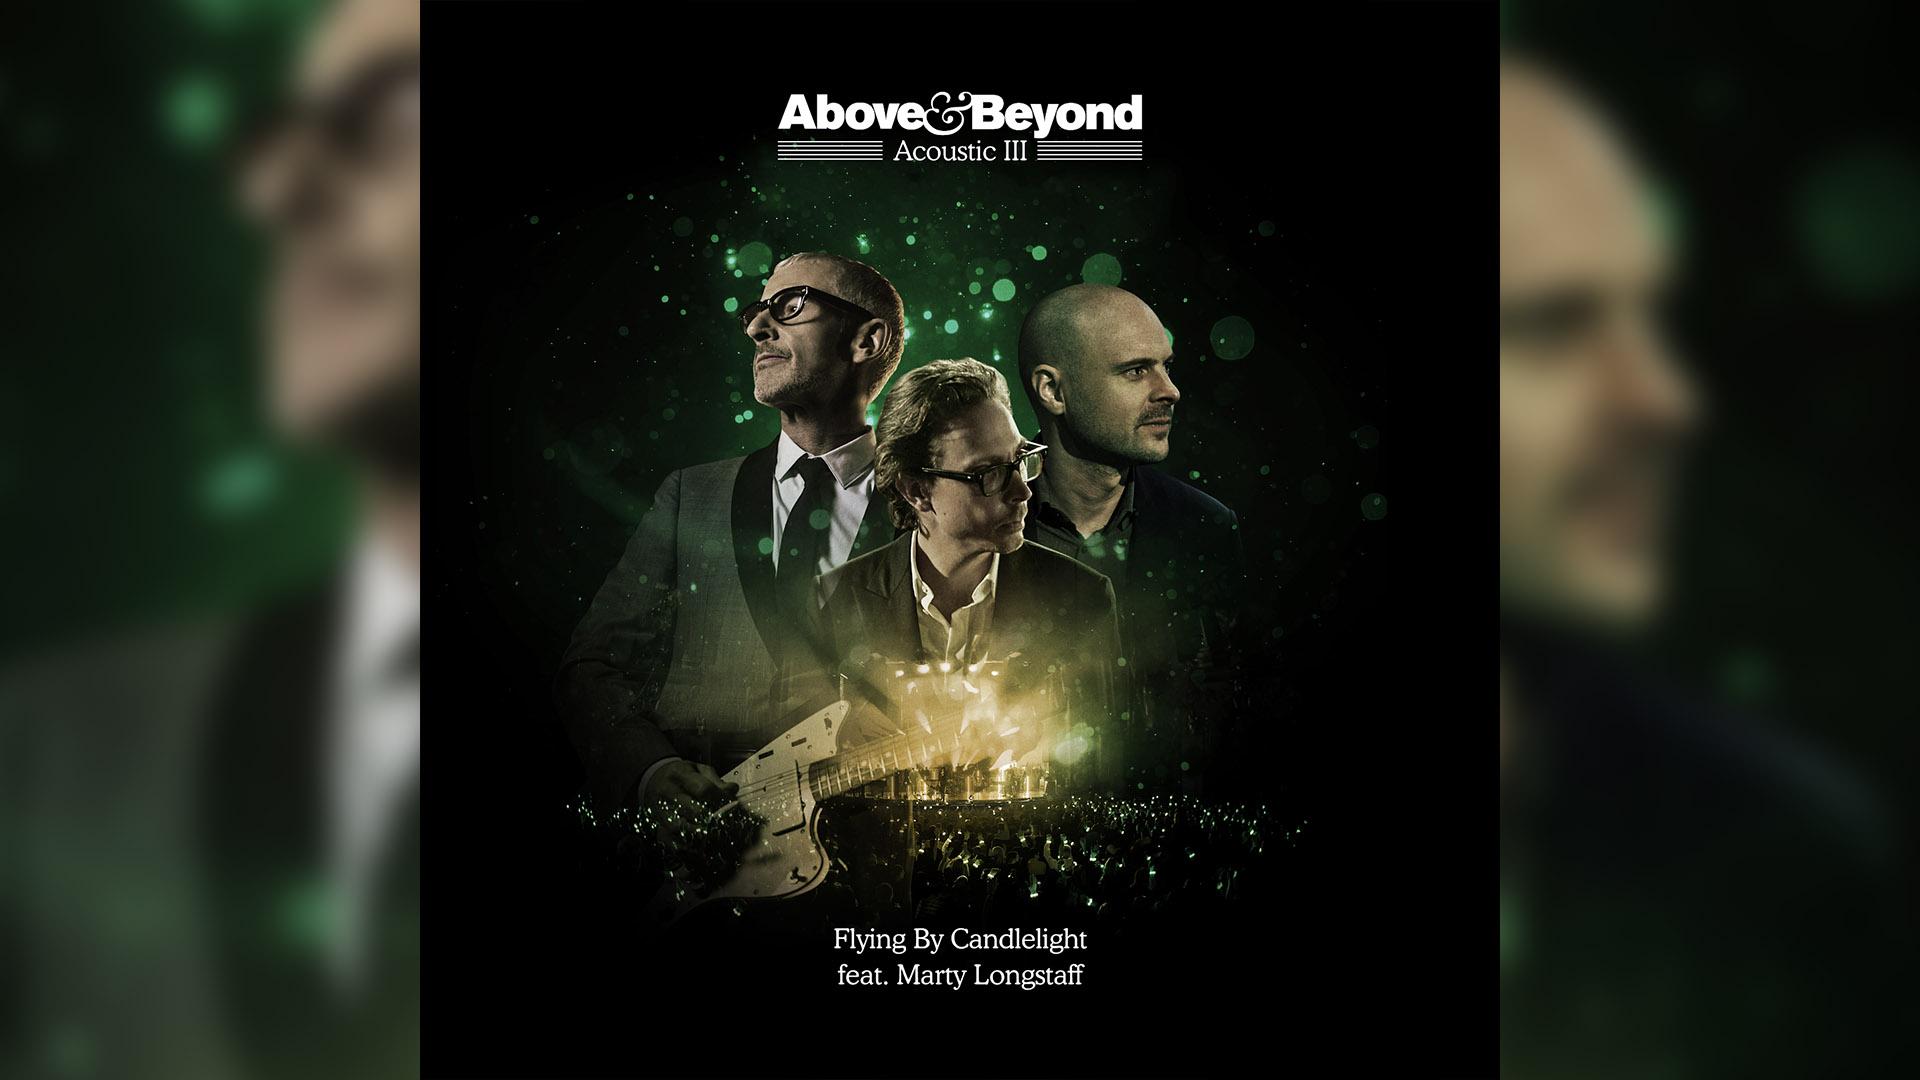 Above & Beyond - Acoustic III